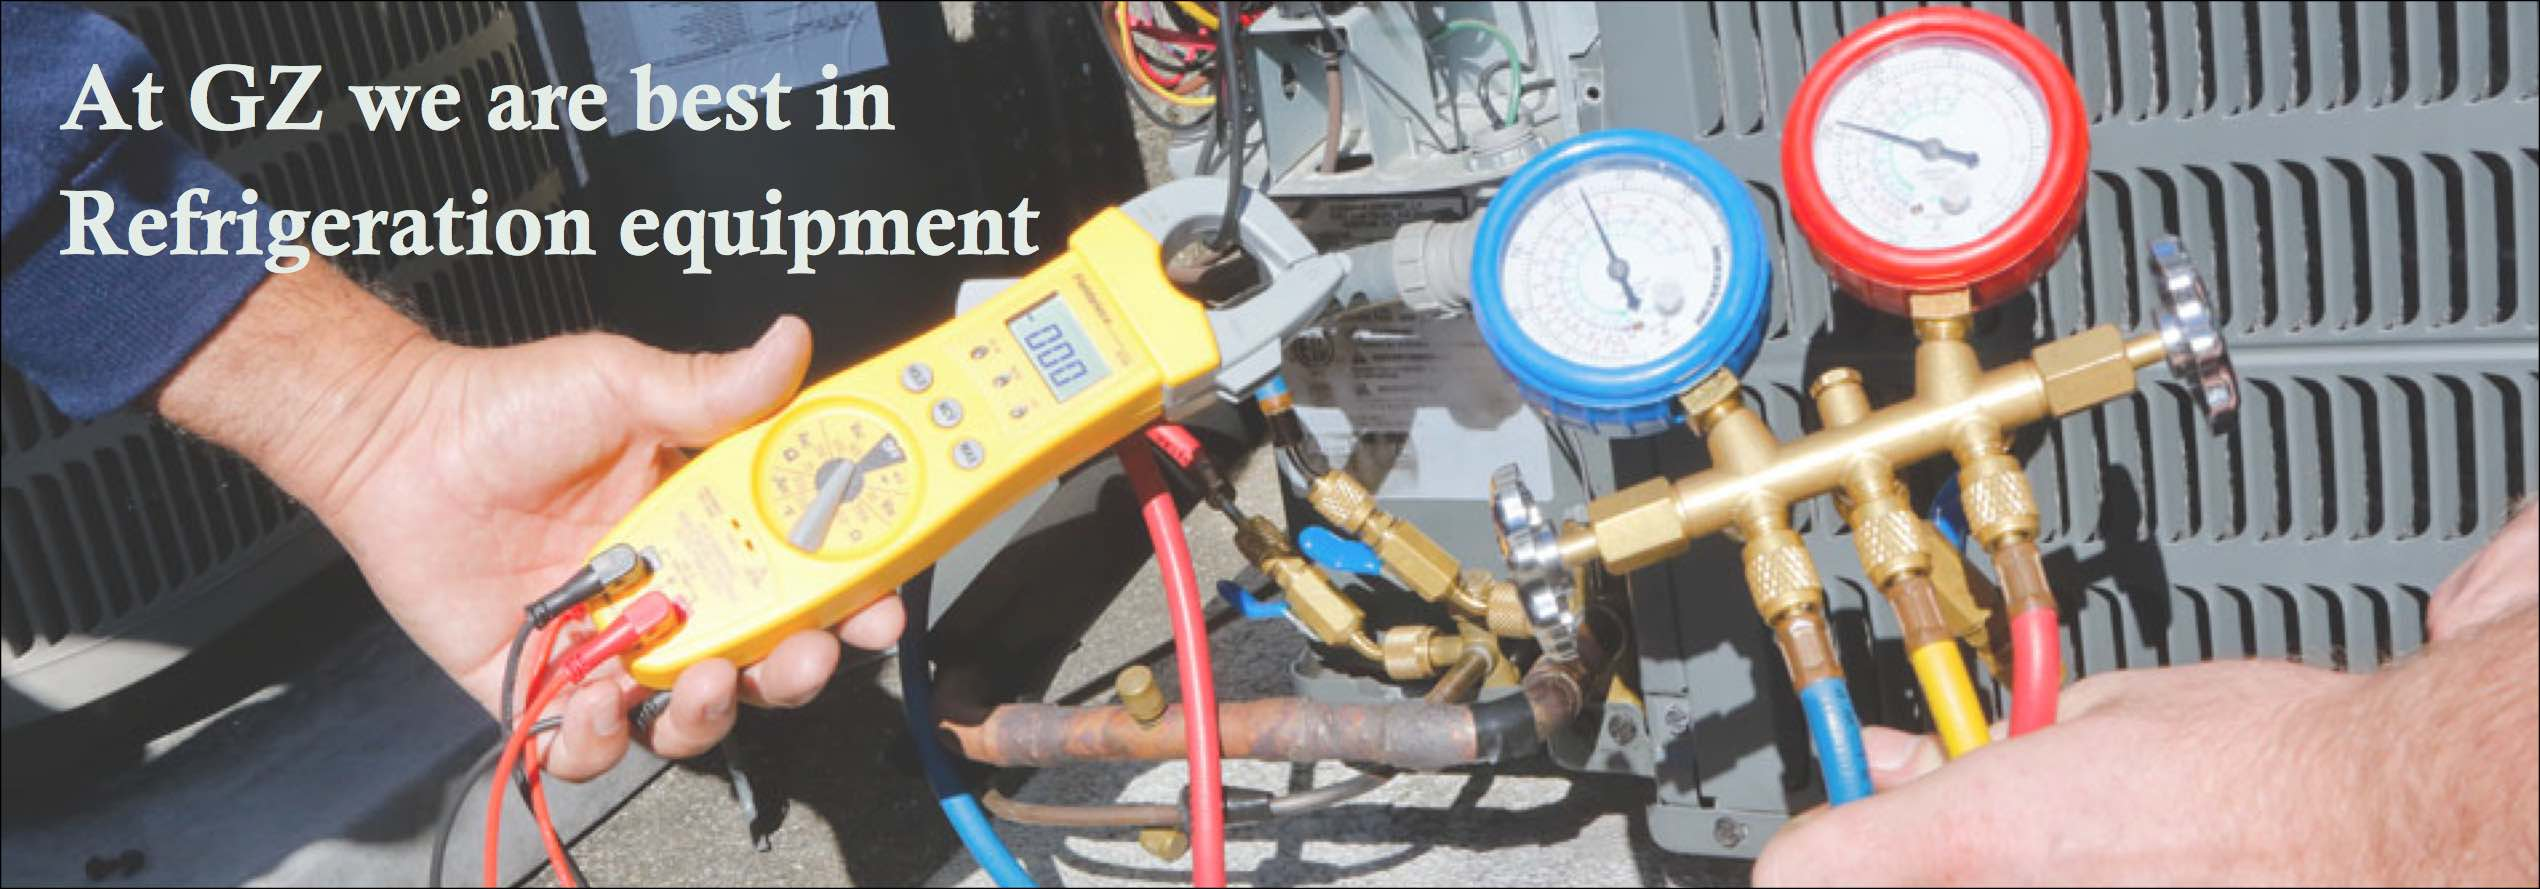 airconditioning-banner-jpeg.jpg